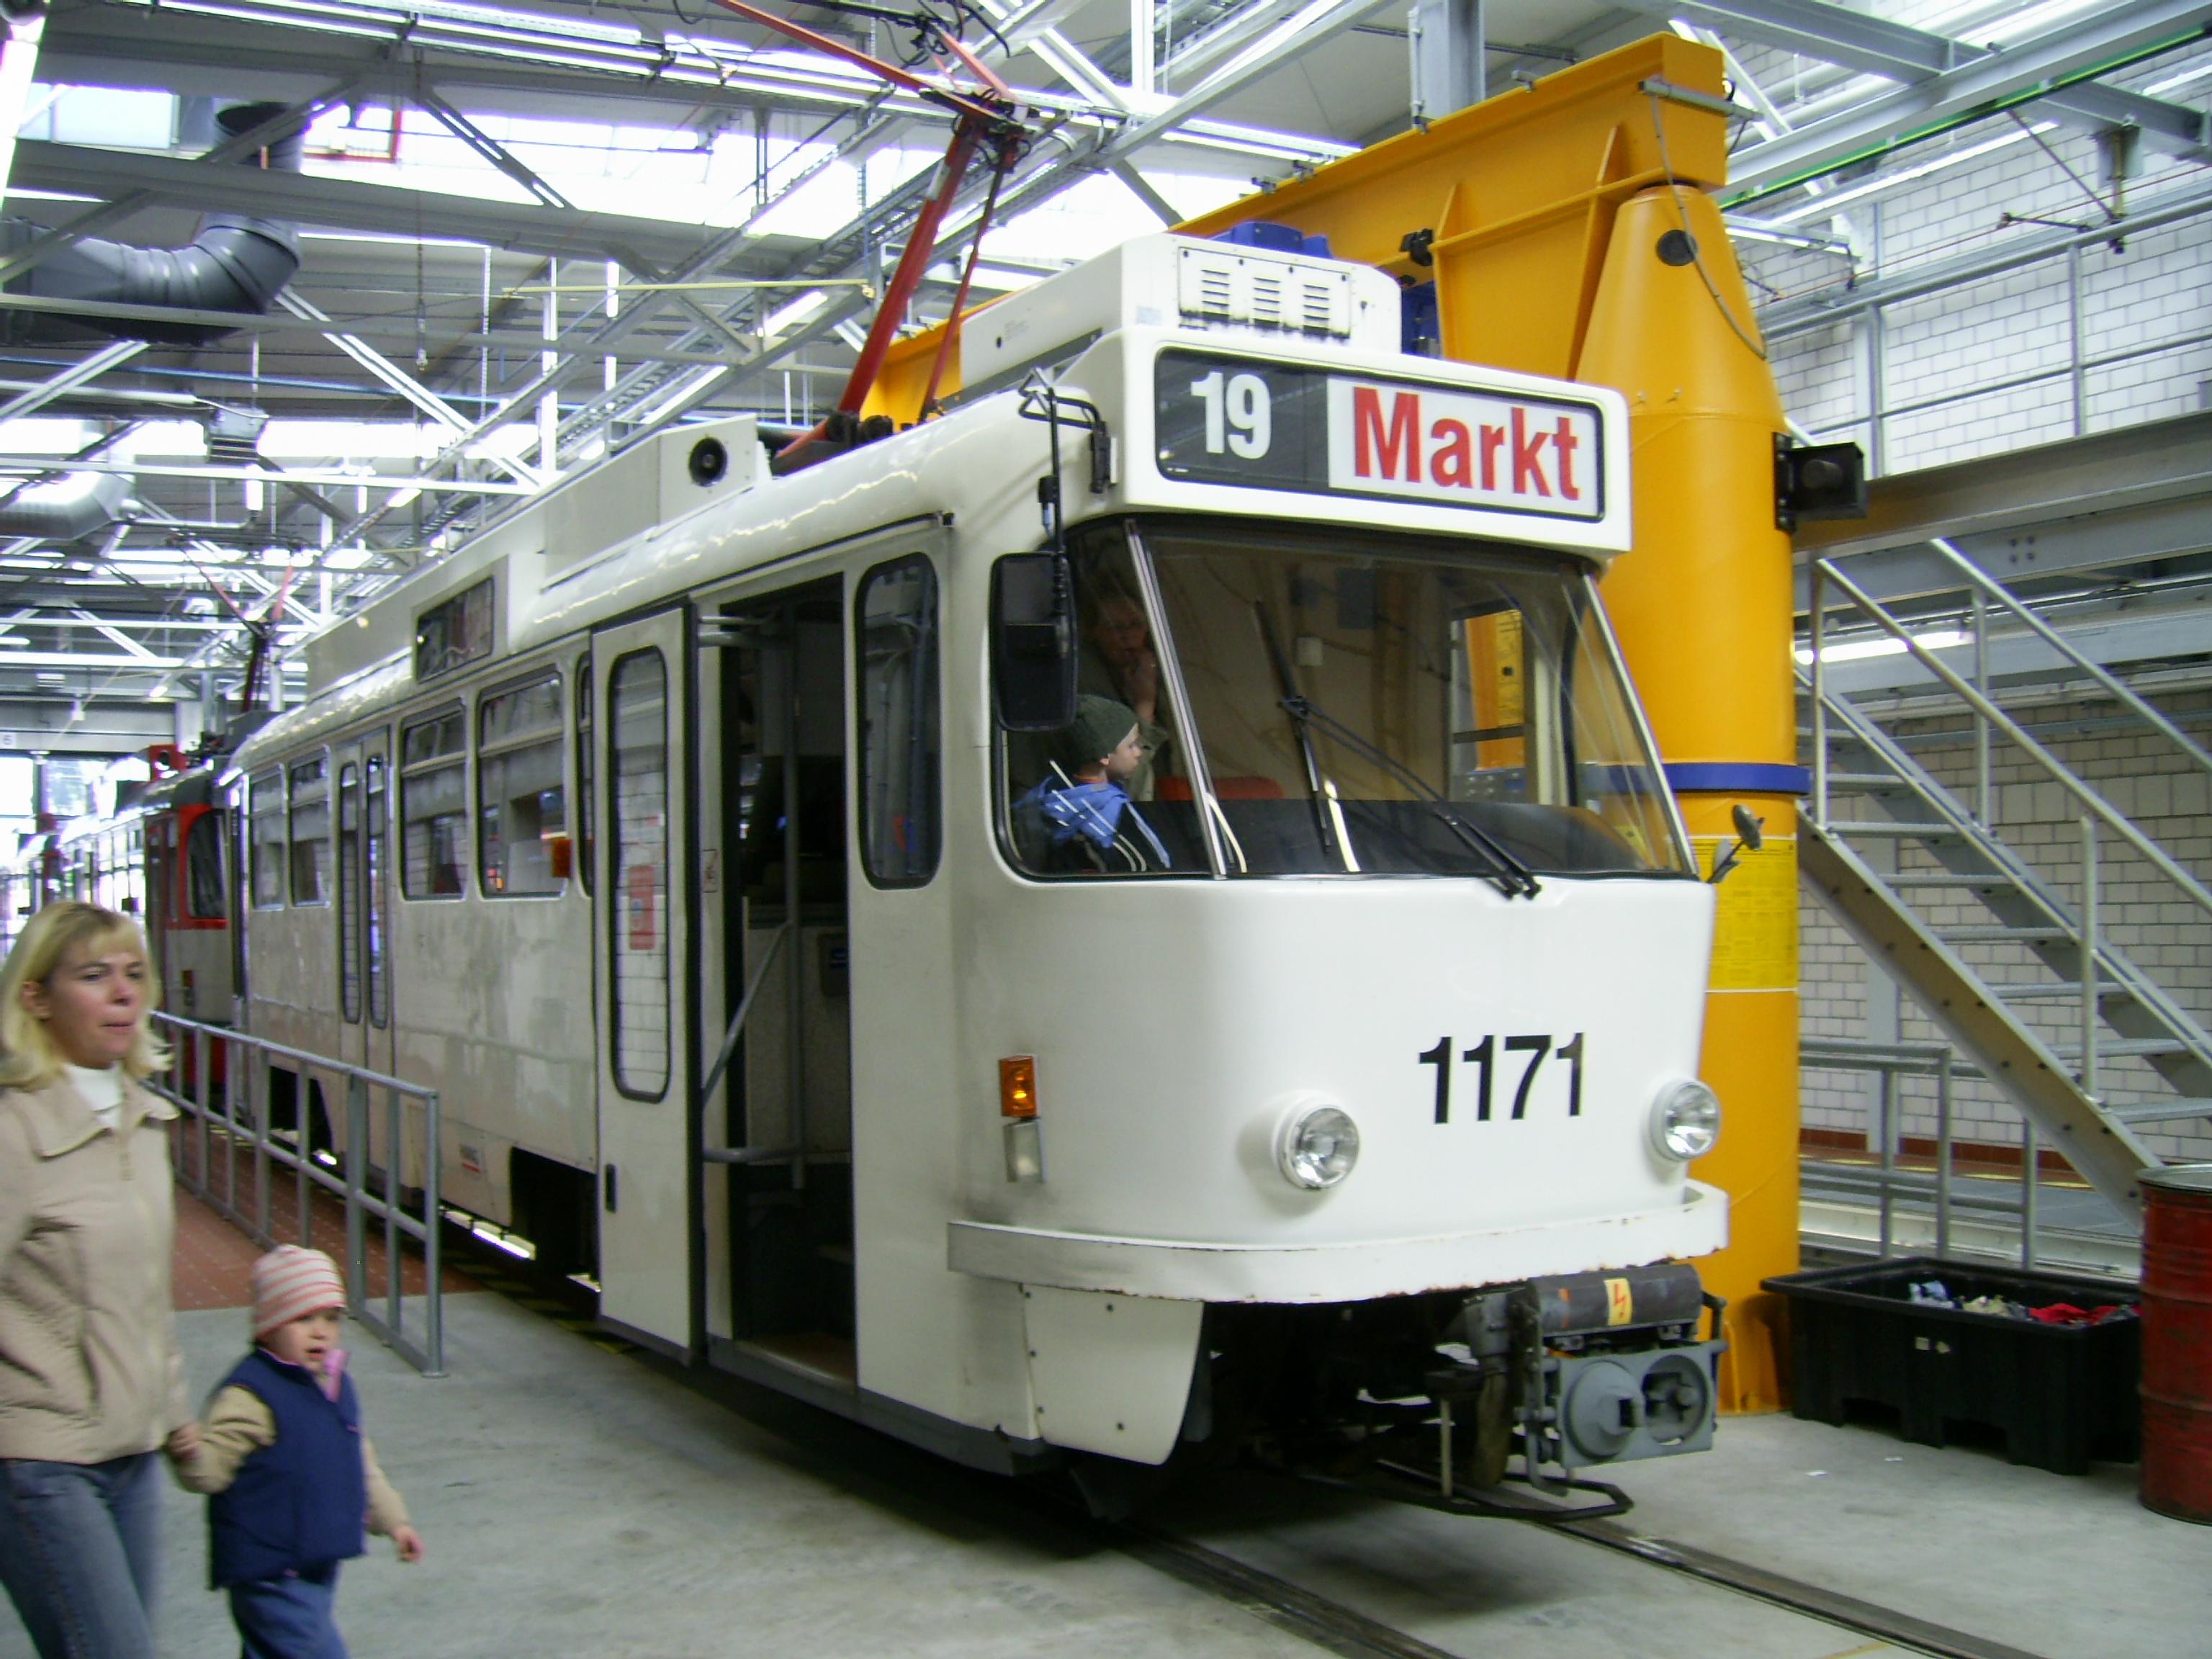 File:Strassenbahn Halle Tw 1171.JPG